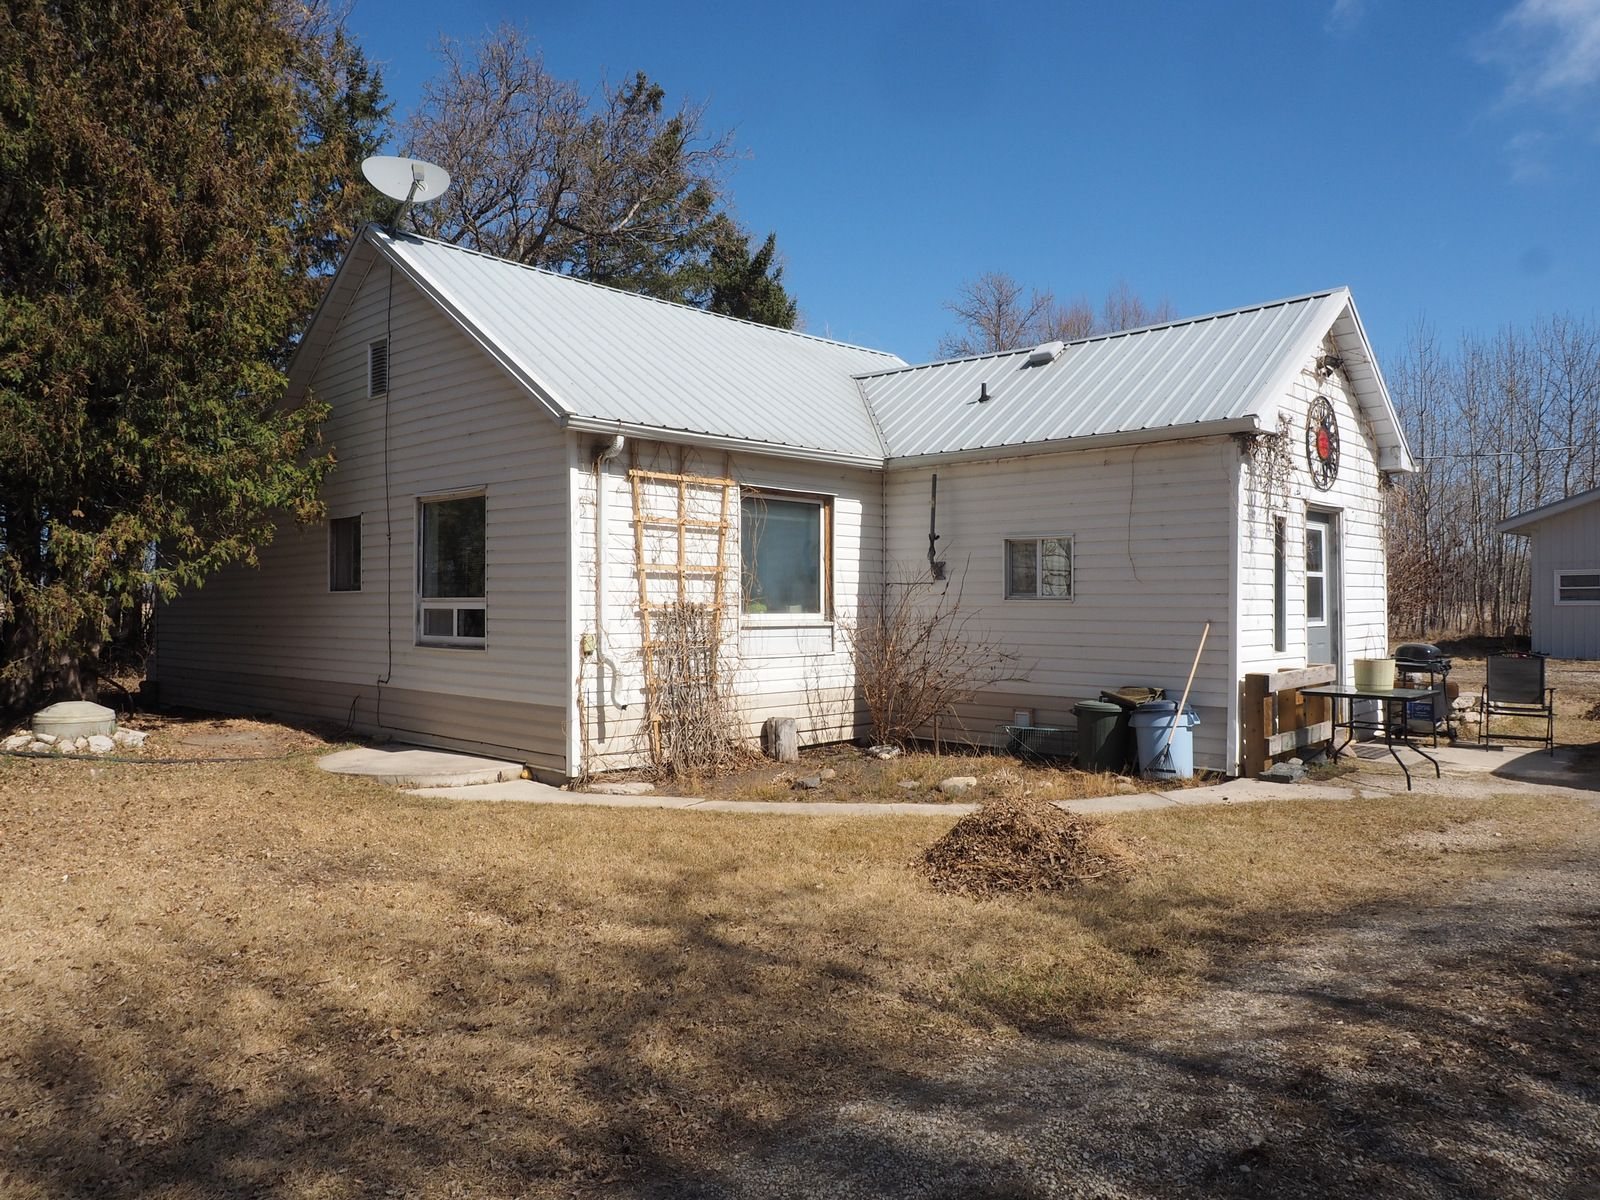 Main Photo: 69065 PR 430 in Oakville: House for sale : MLS®# 202107903